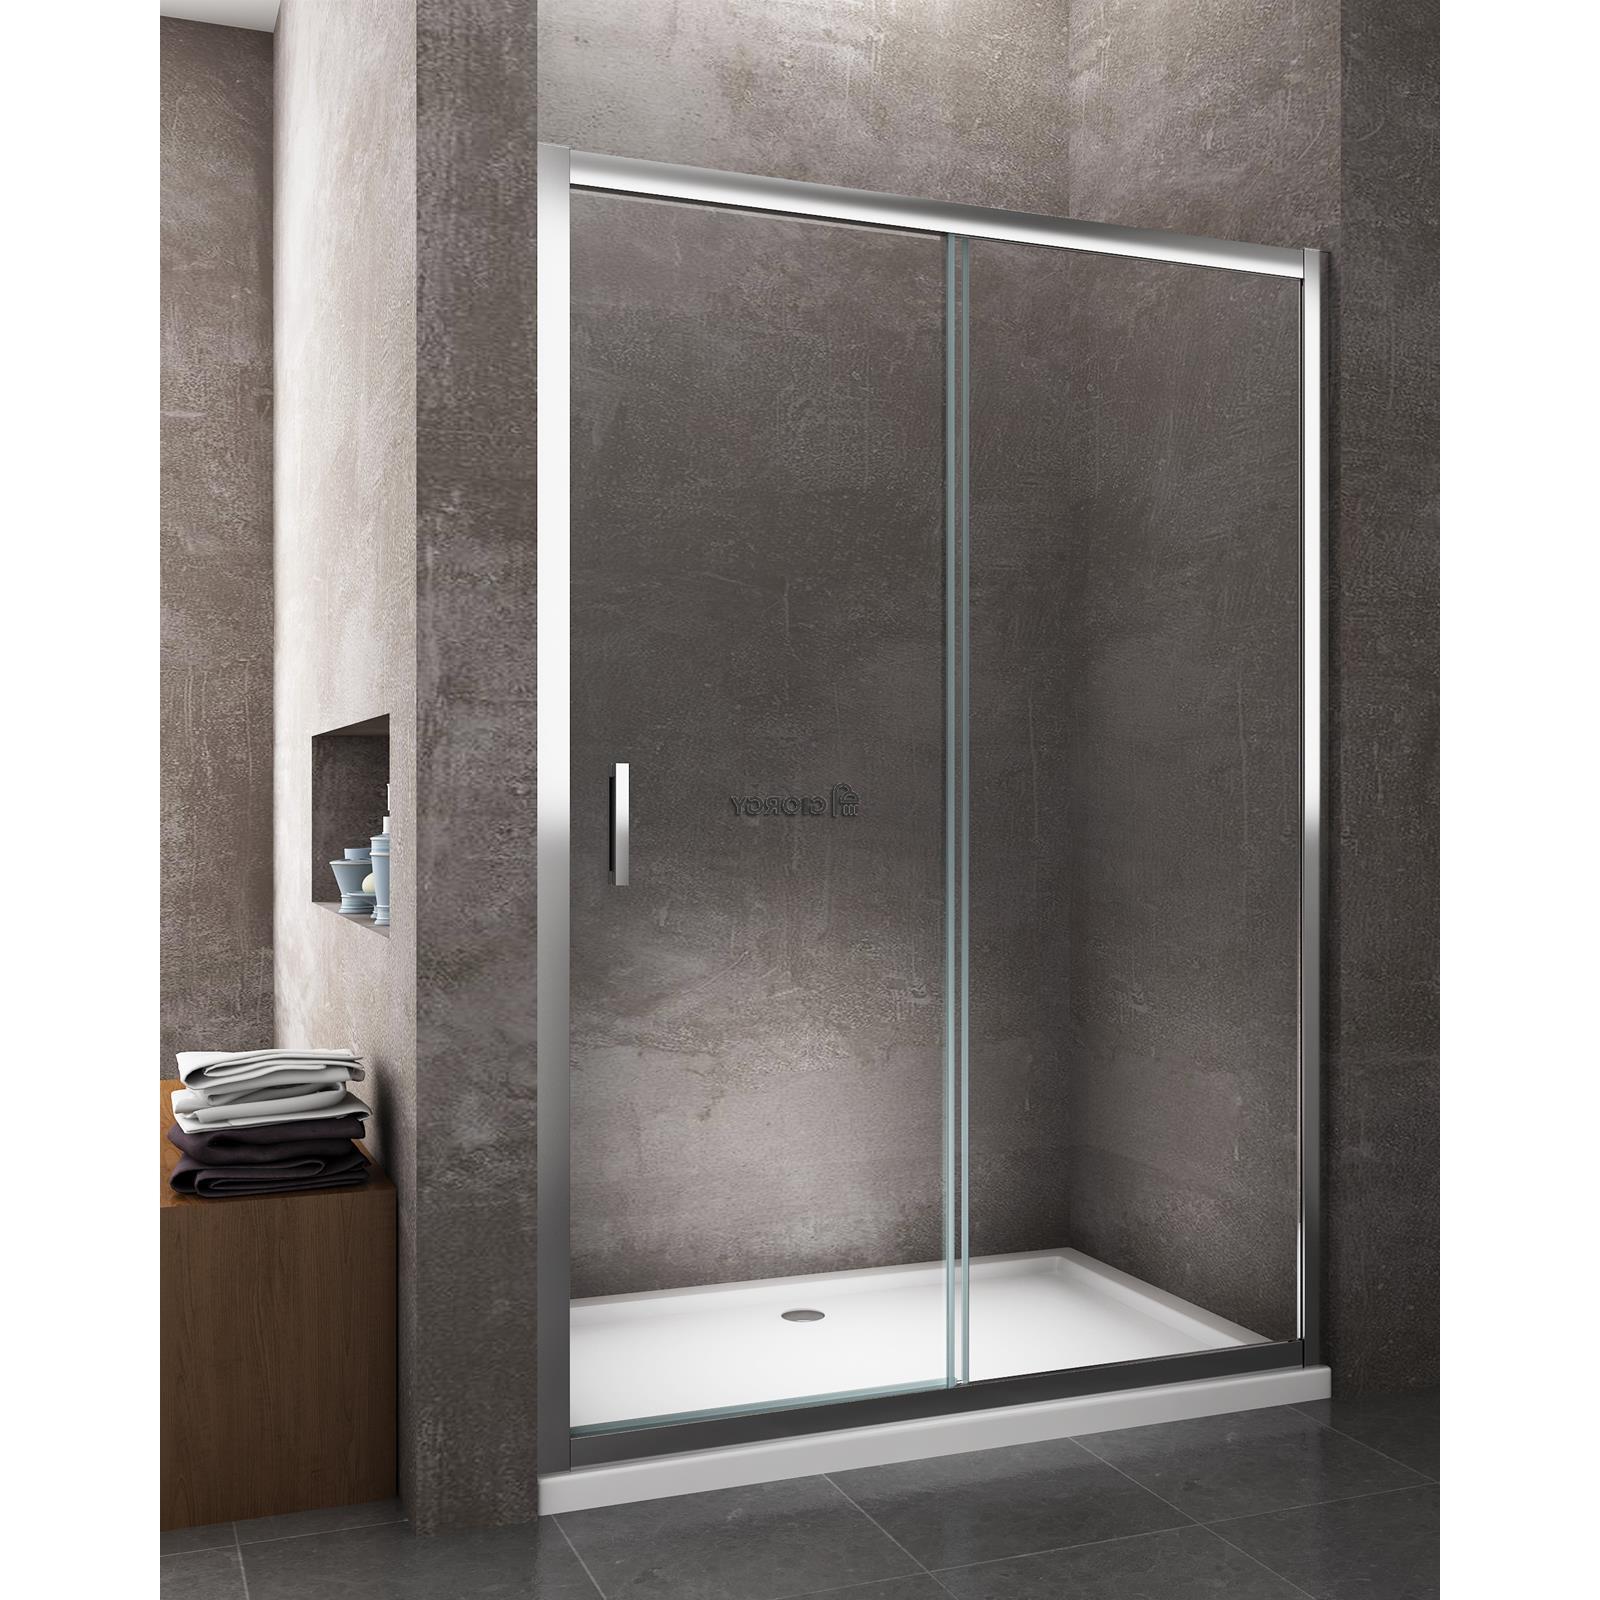 Porta doccia scorrevole nicchia 110 111 112 113 114 115 h 190 cm cristallo 6 mm ebay - Porta doccia nicchia prezzi ...